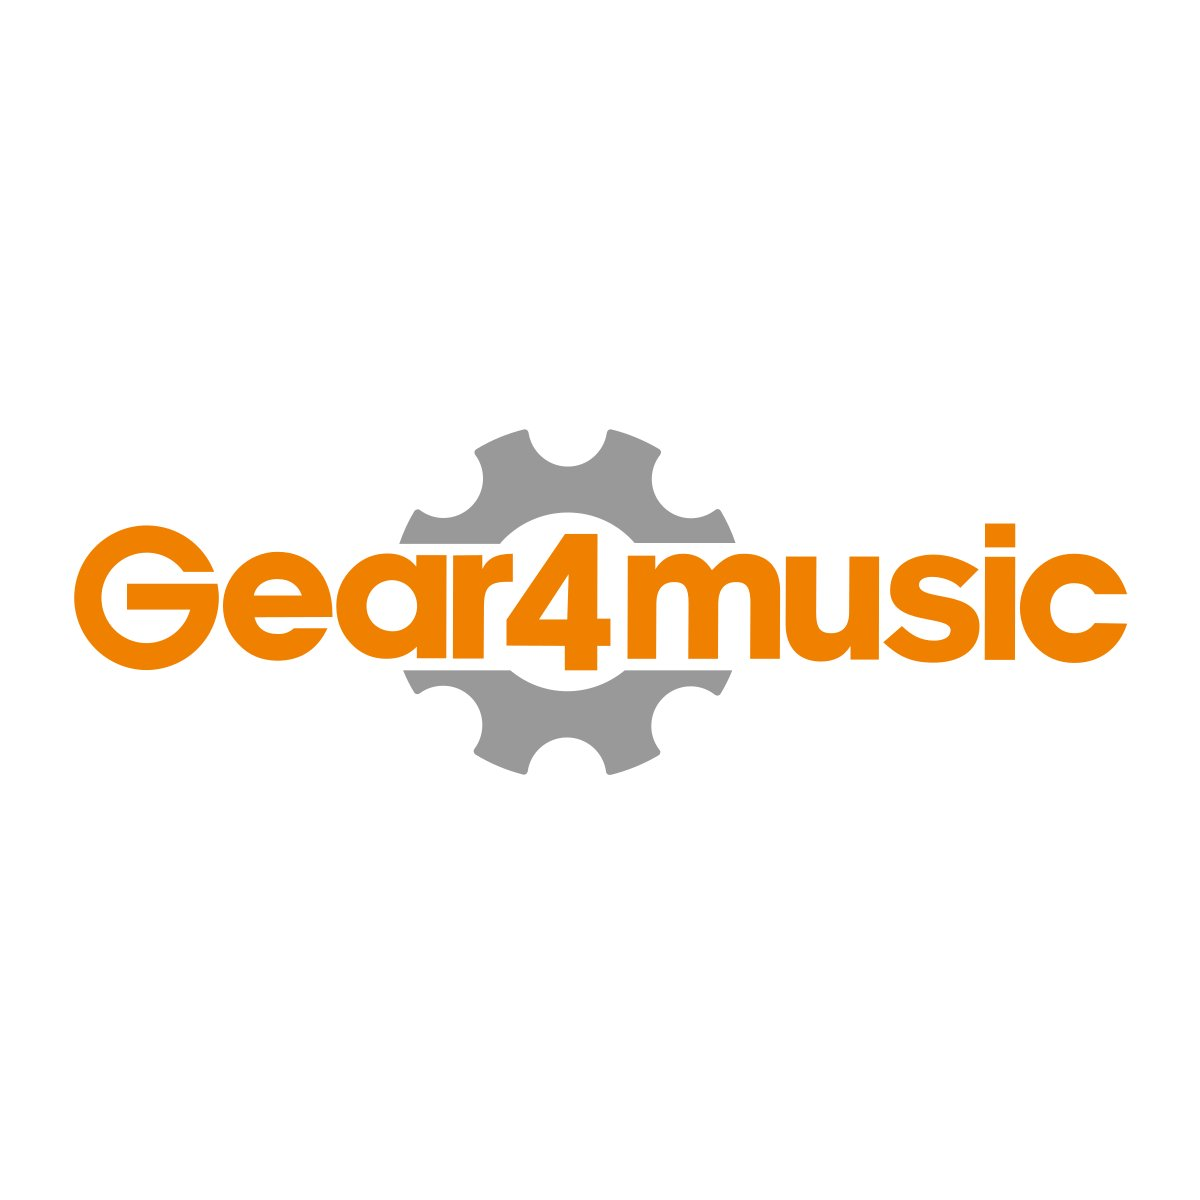 http://cdns3.gear4music.com/media/14/144433/1200/preview.jpg